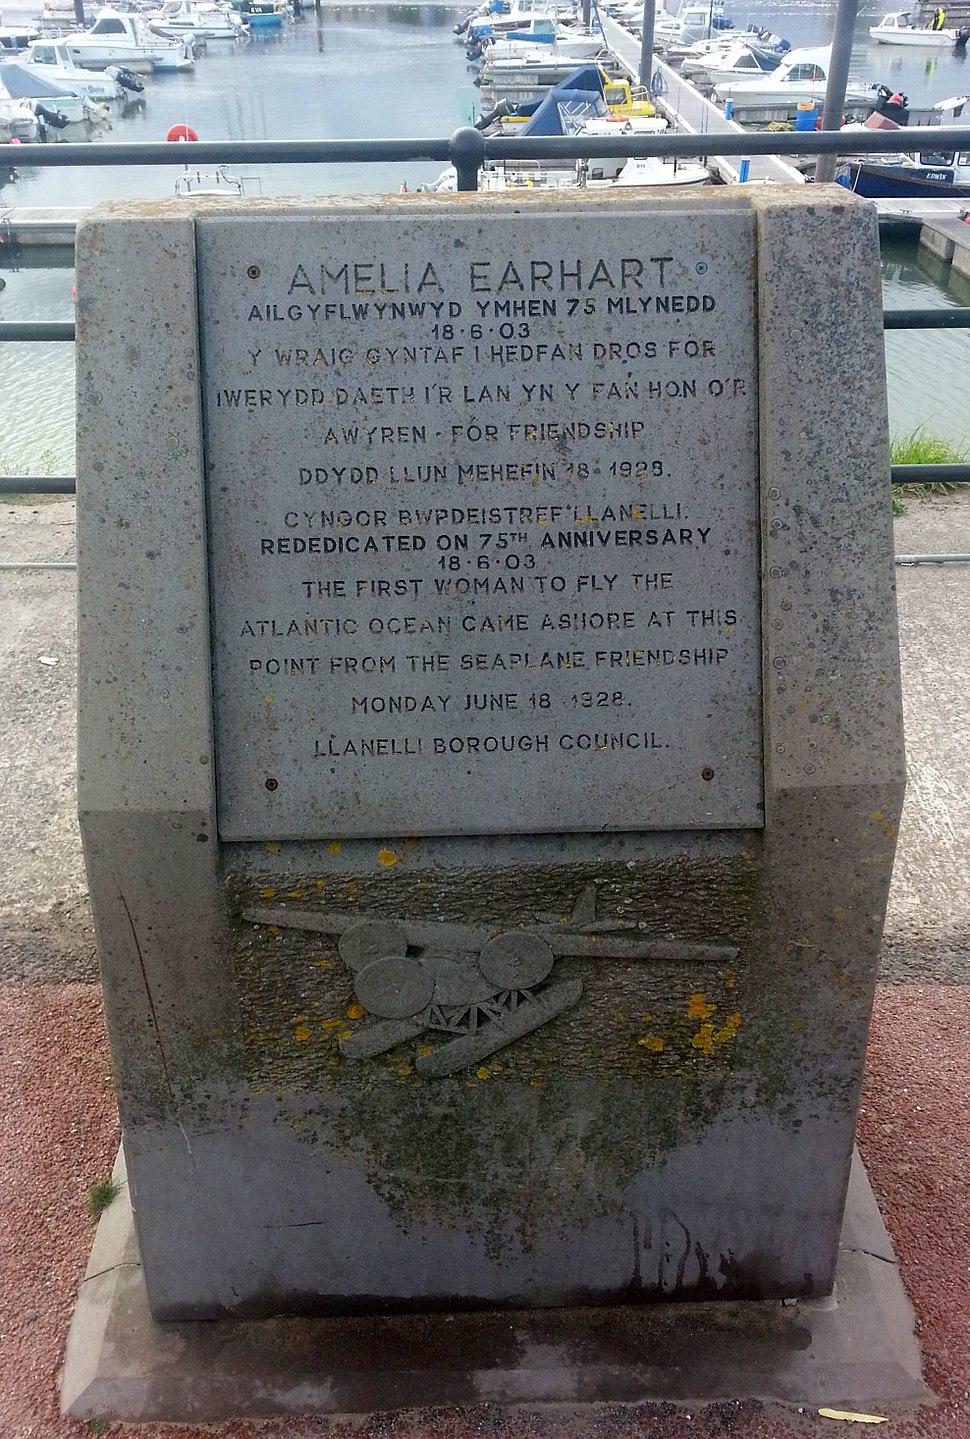 Amelia Earhart Commemoration Stone - Burry Port